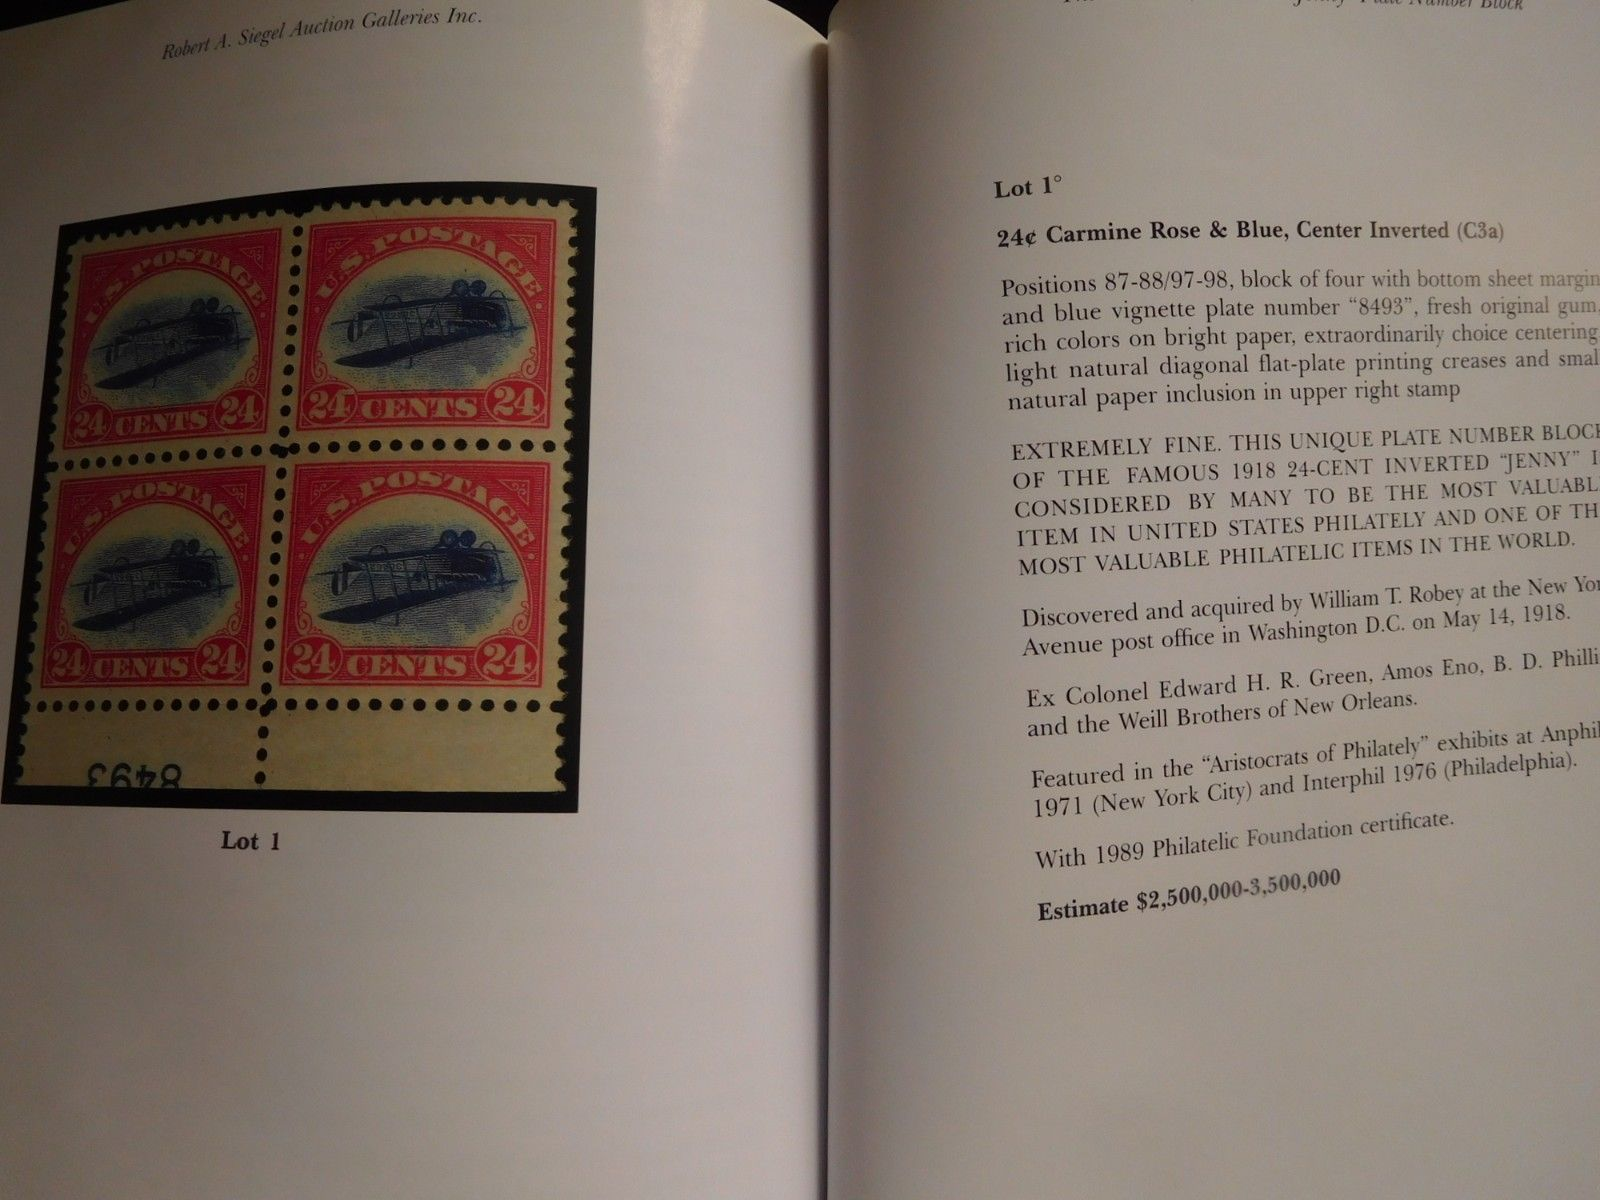 Robert Siegel 2005 Inverted Jenny Plate Number Block Auction Catalog